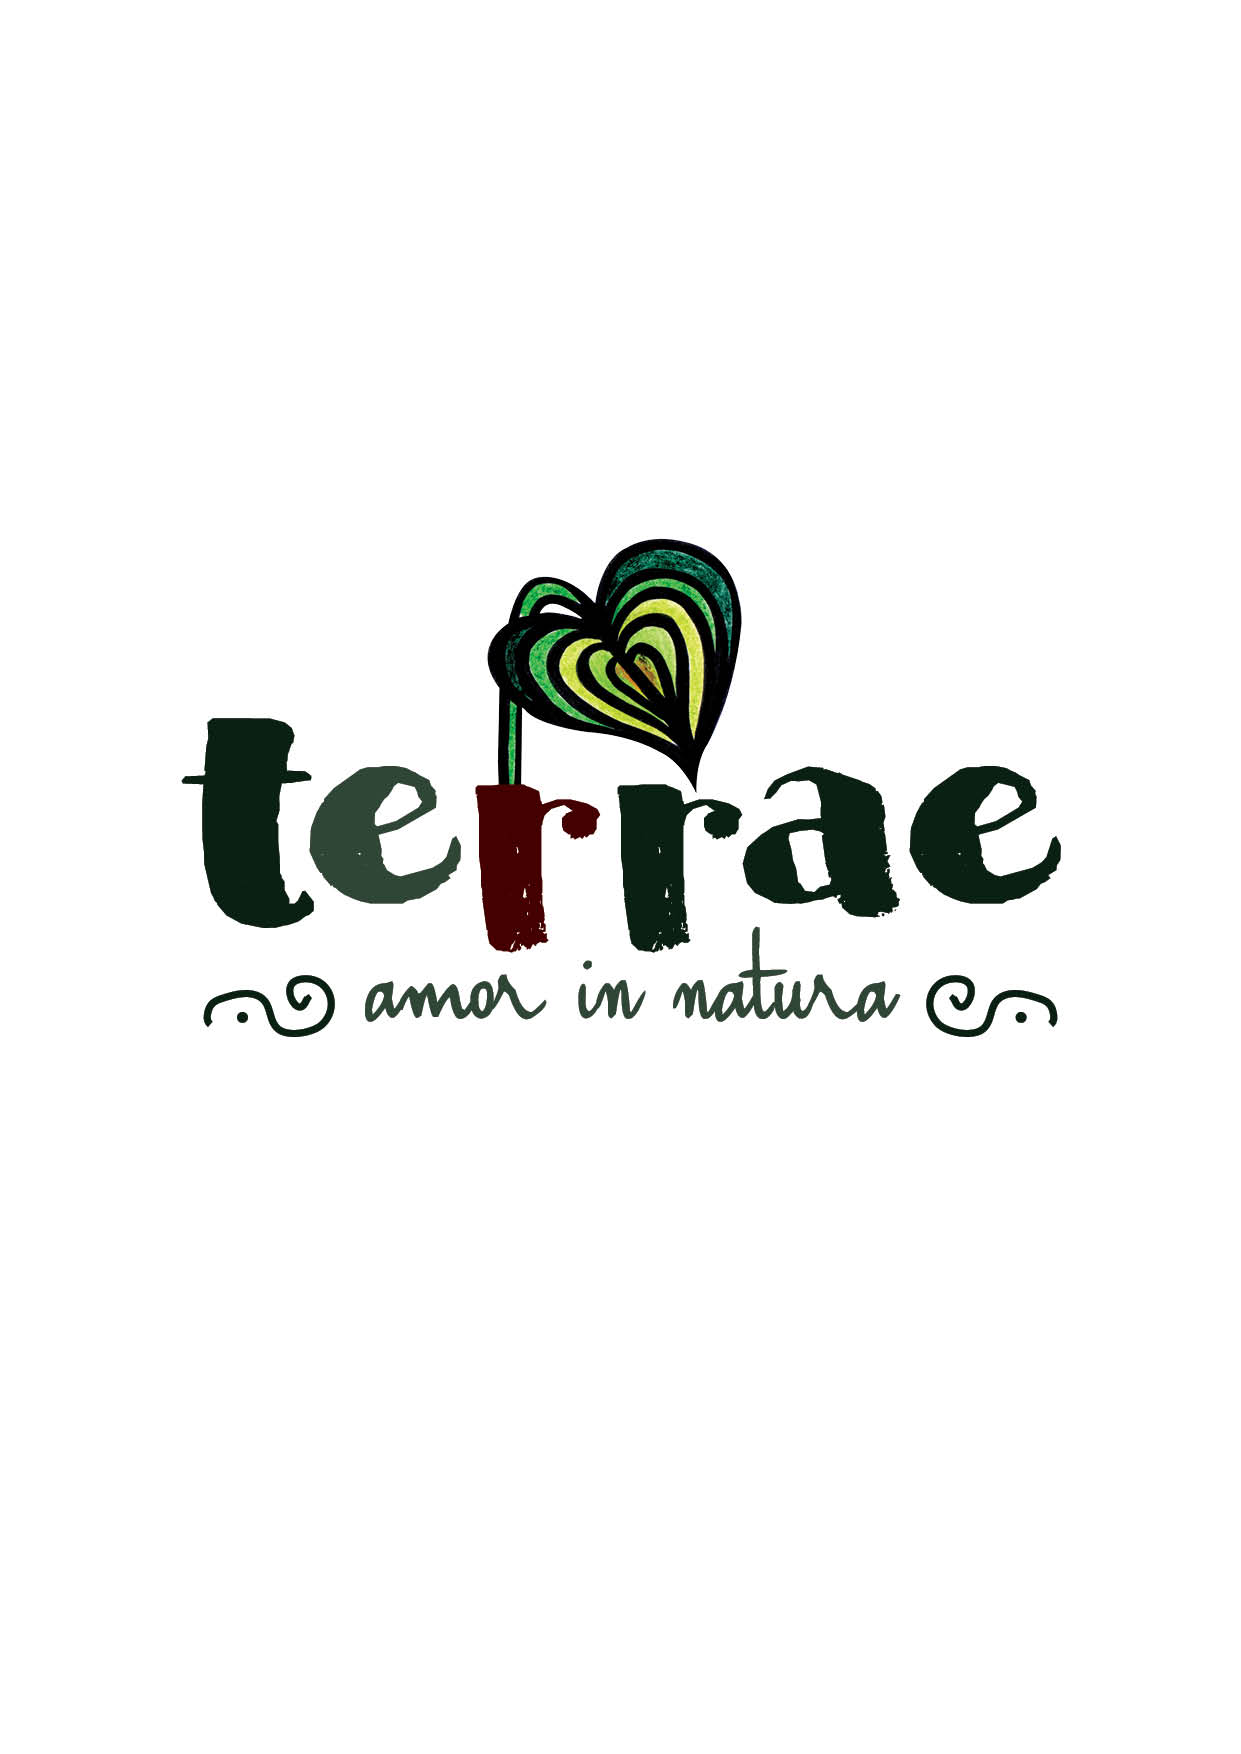 Terrae - amor in natura